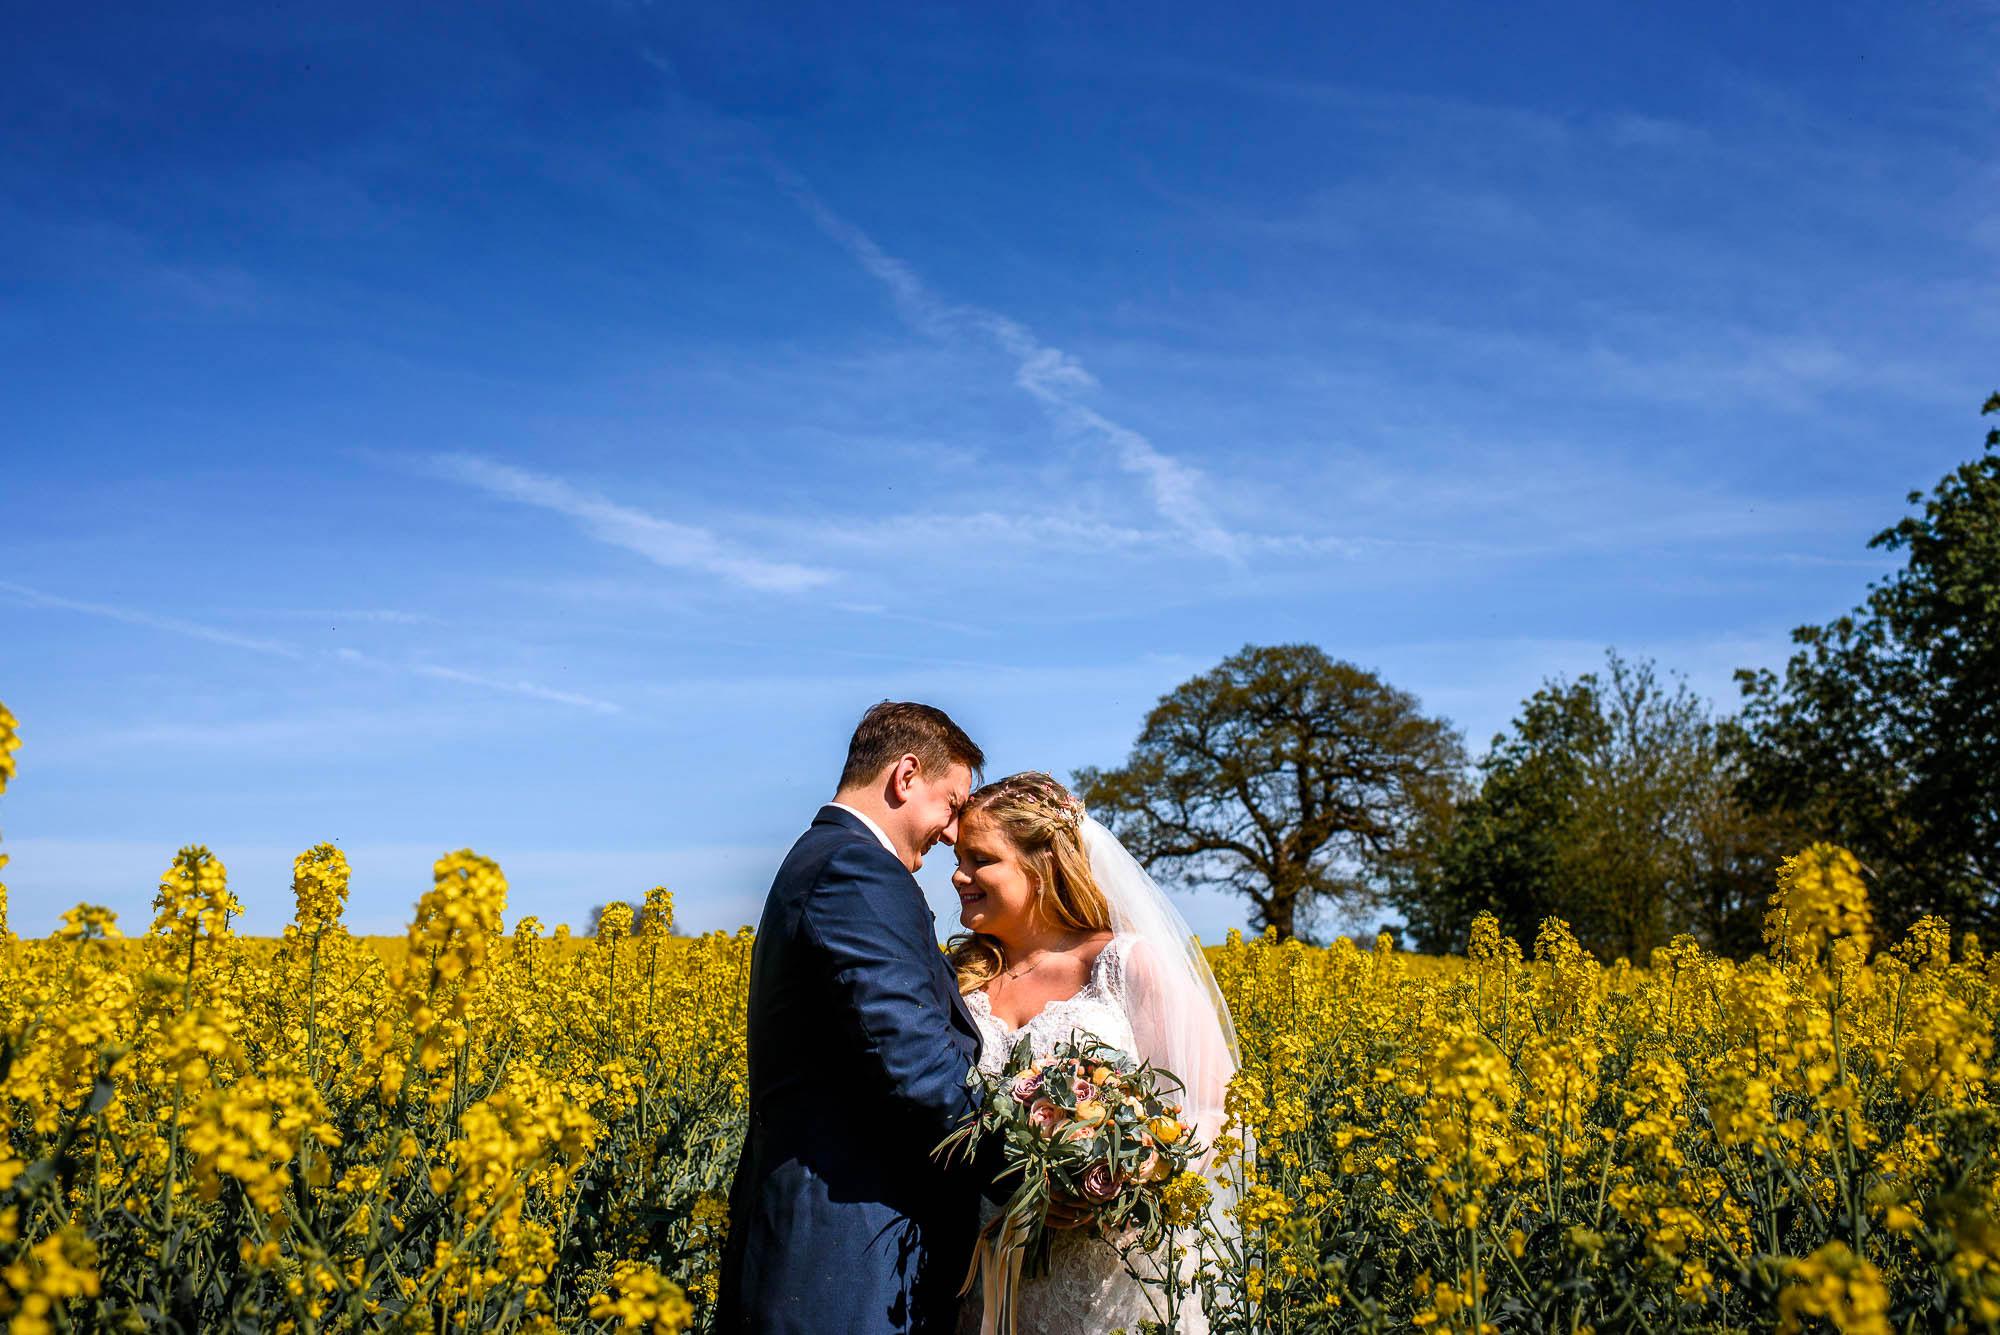 Yeldersley-Hall-Wedding-Derbyshire-Ashbourne-Adam-Lowndes-Photography-Staffordshire-Wedding-Photography-2295-new